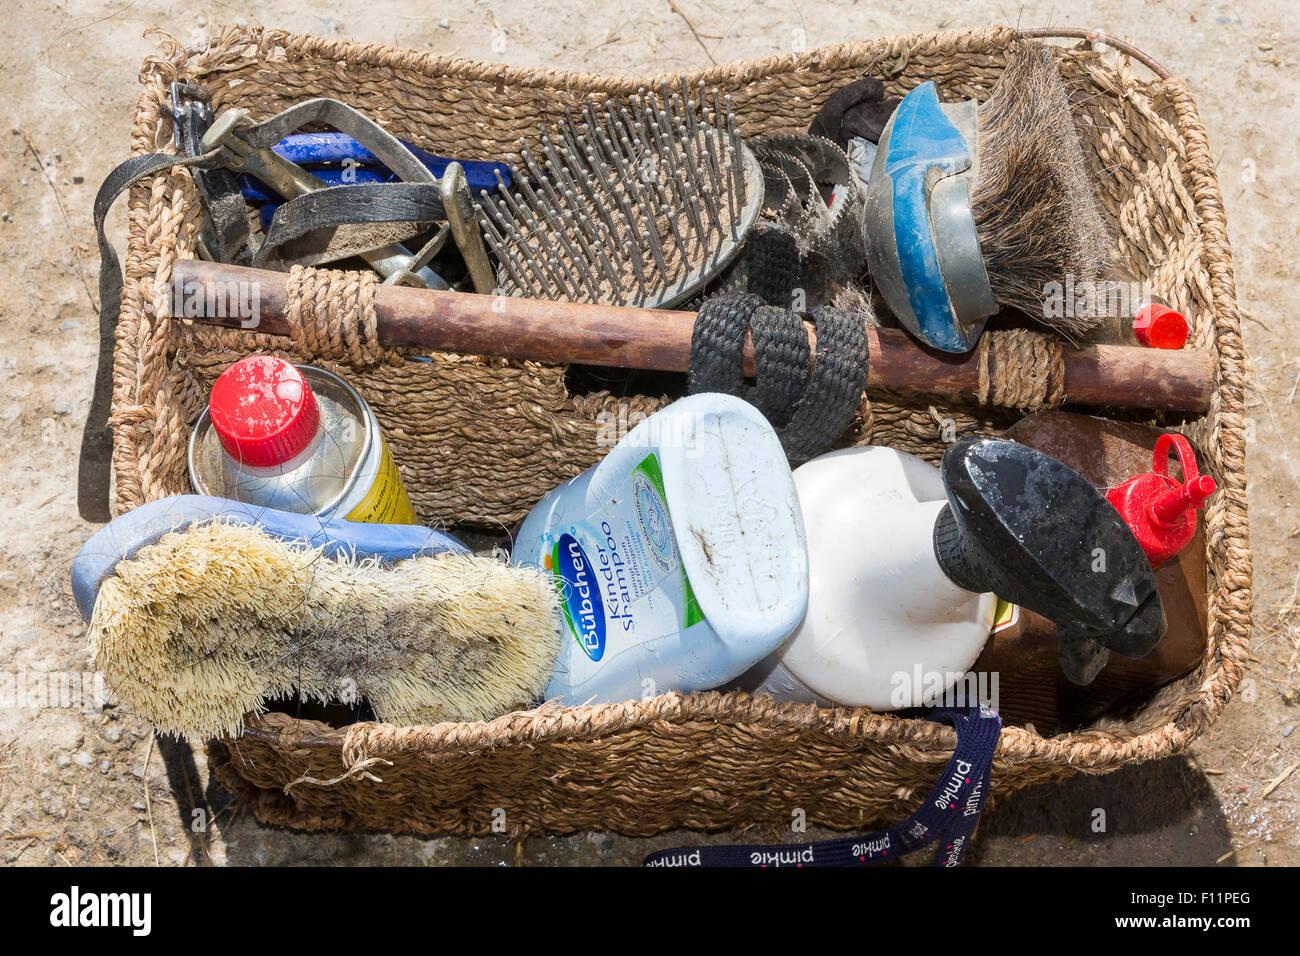 Kit de aseo del caballo doméstico Imagen De Stock